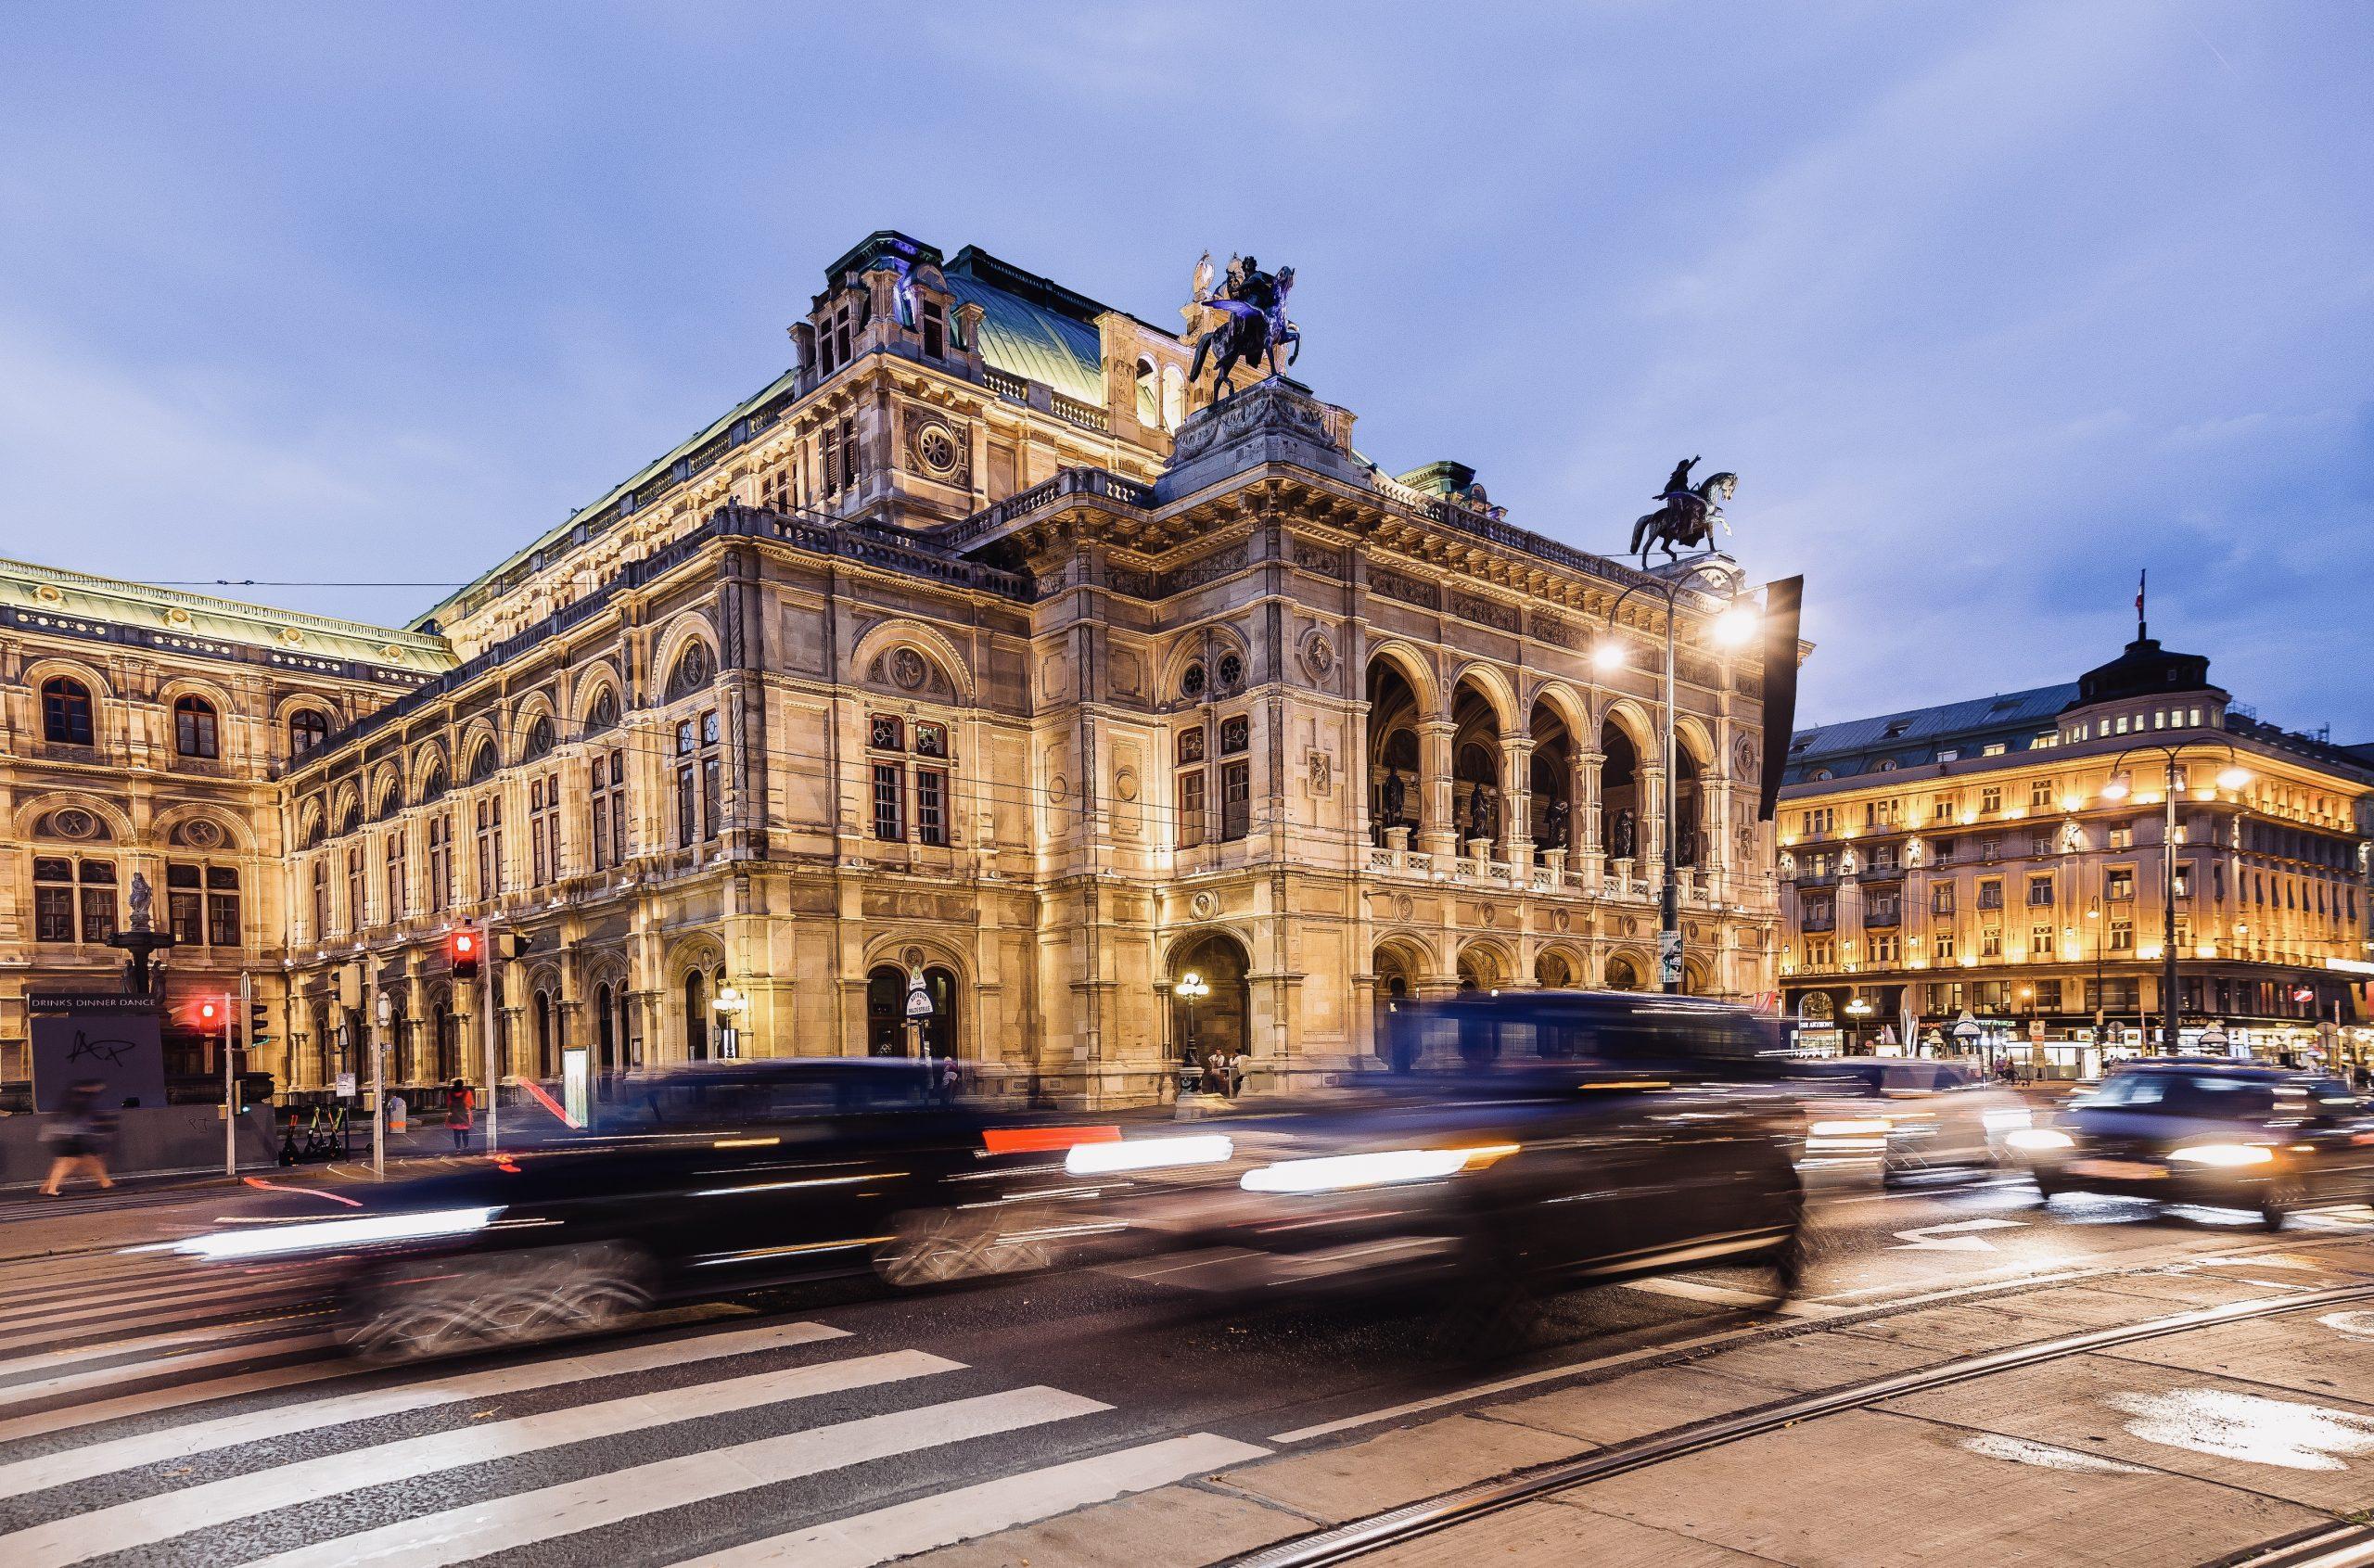 vienna-opera-house-by-night-wien-staatsoper-bei-na-XXRBUKD